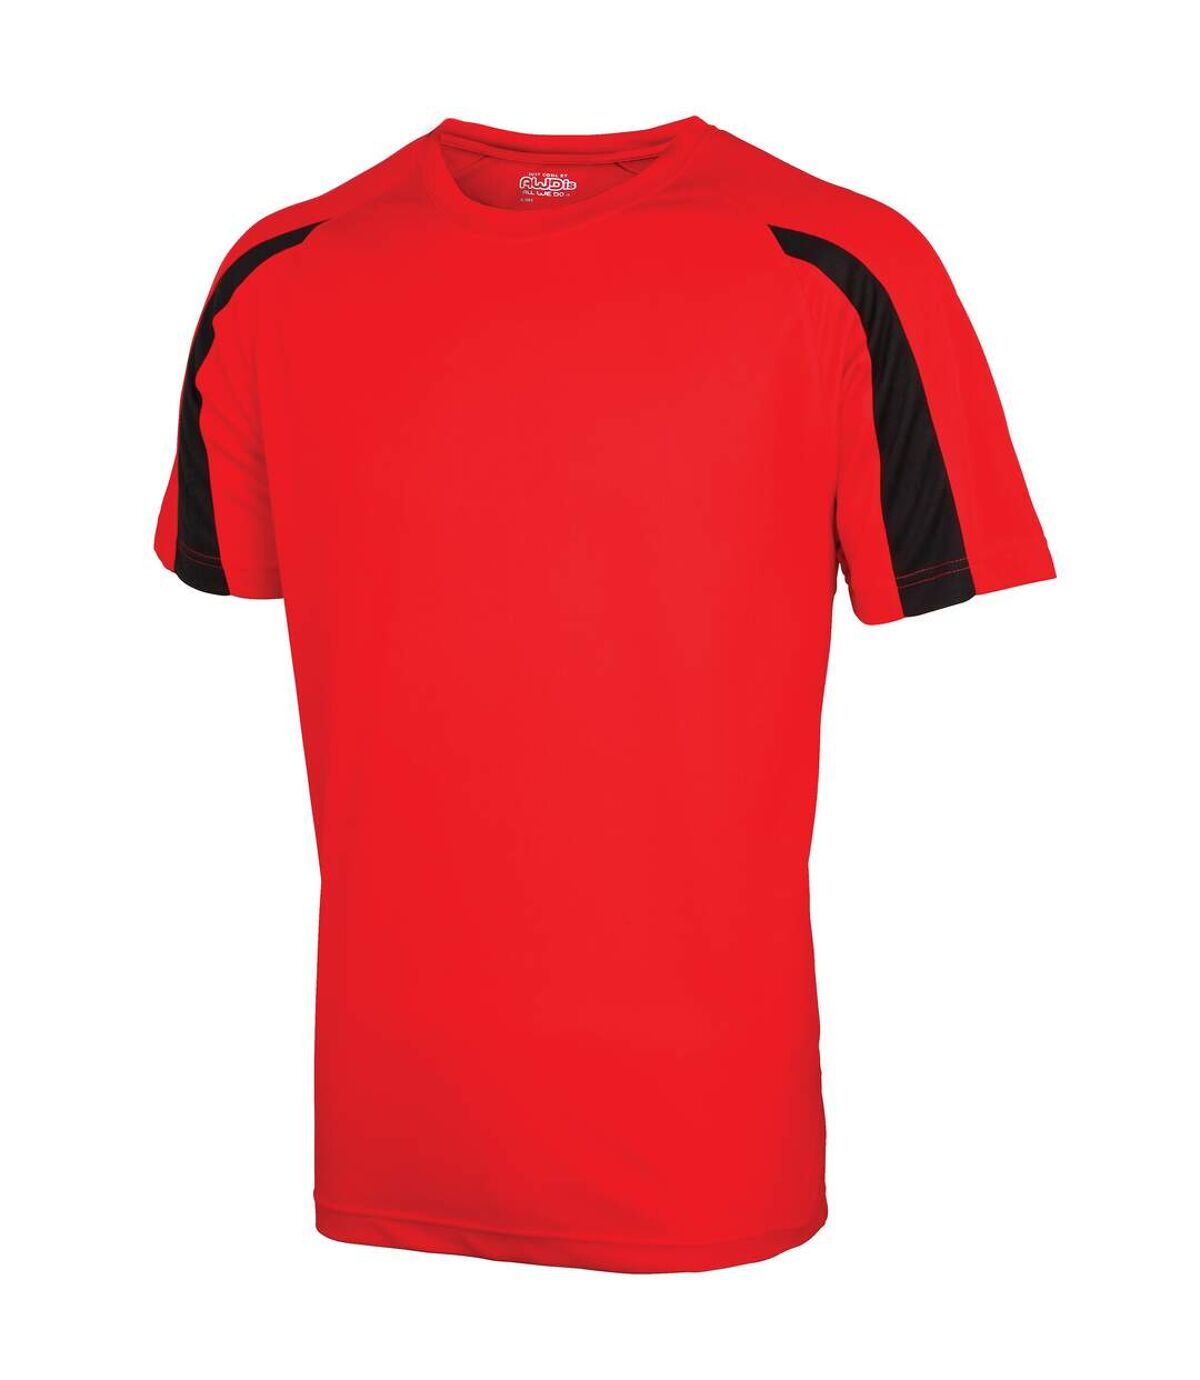 Just Cool Mens Contrast Cool Sports Plain T-Shirt (Arctic White/Sapphire Blue) - UTRW685